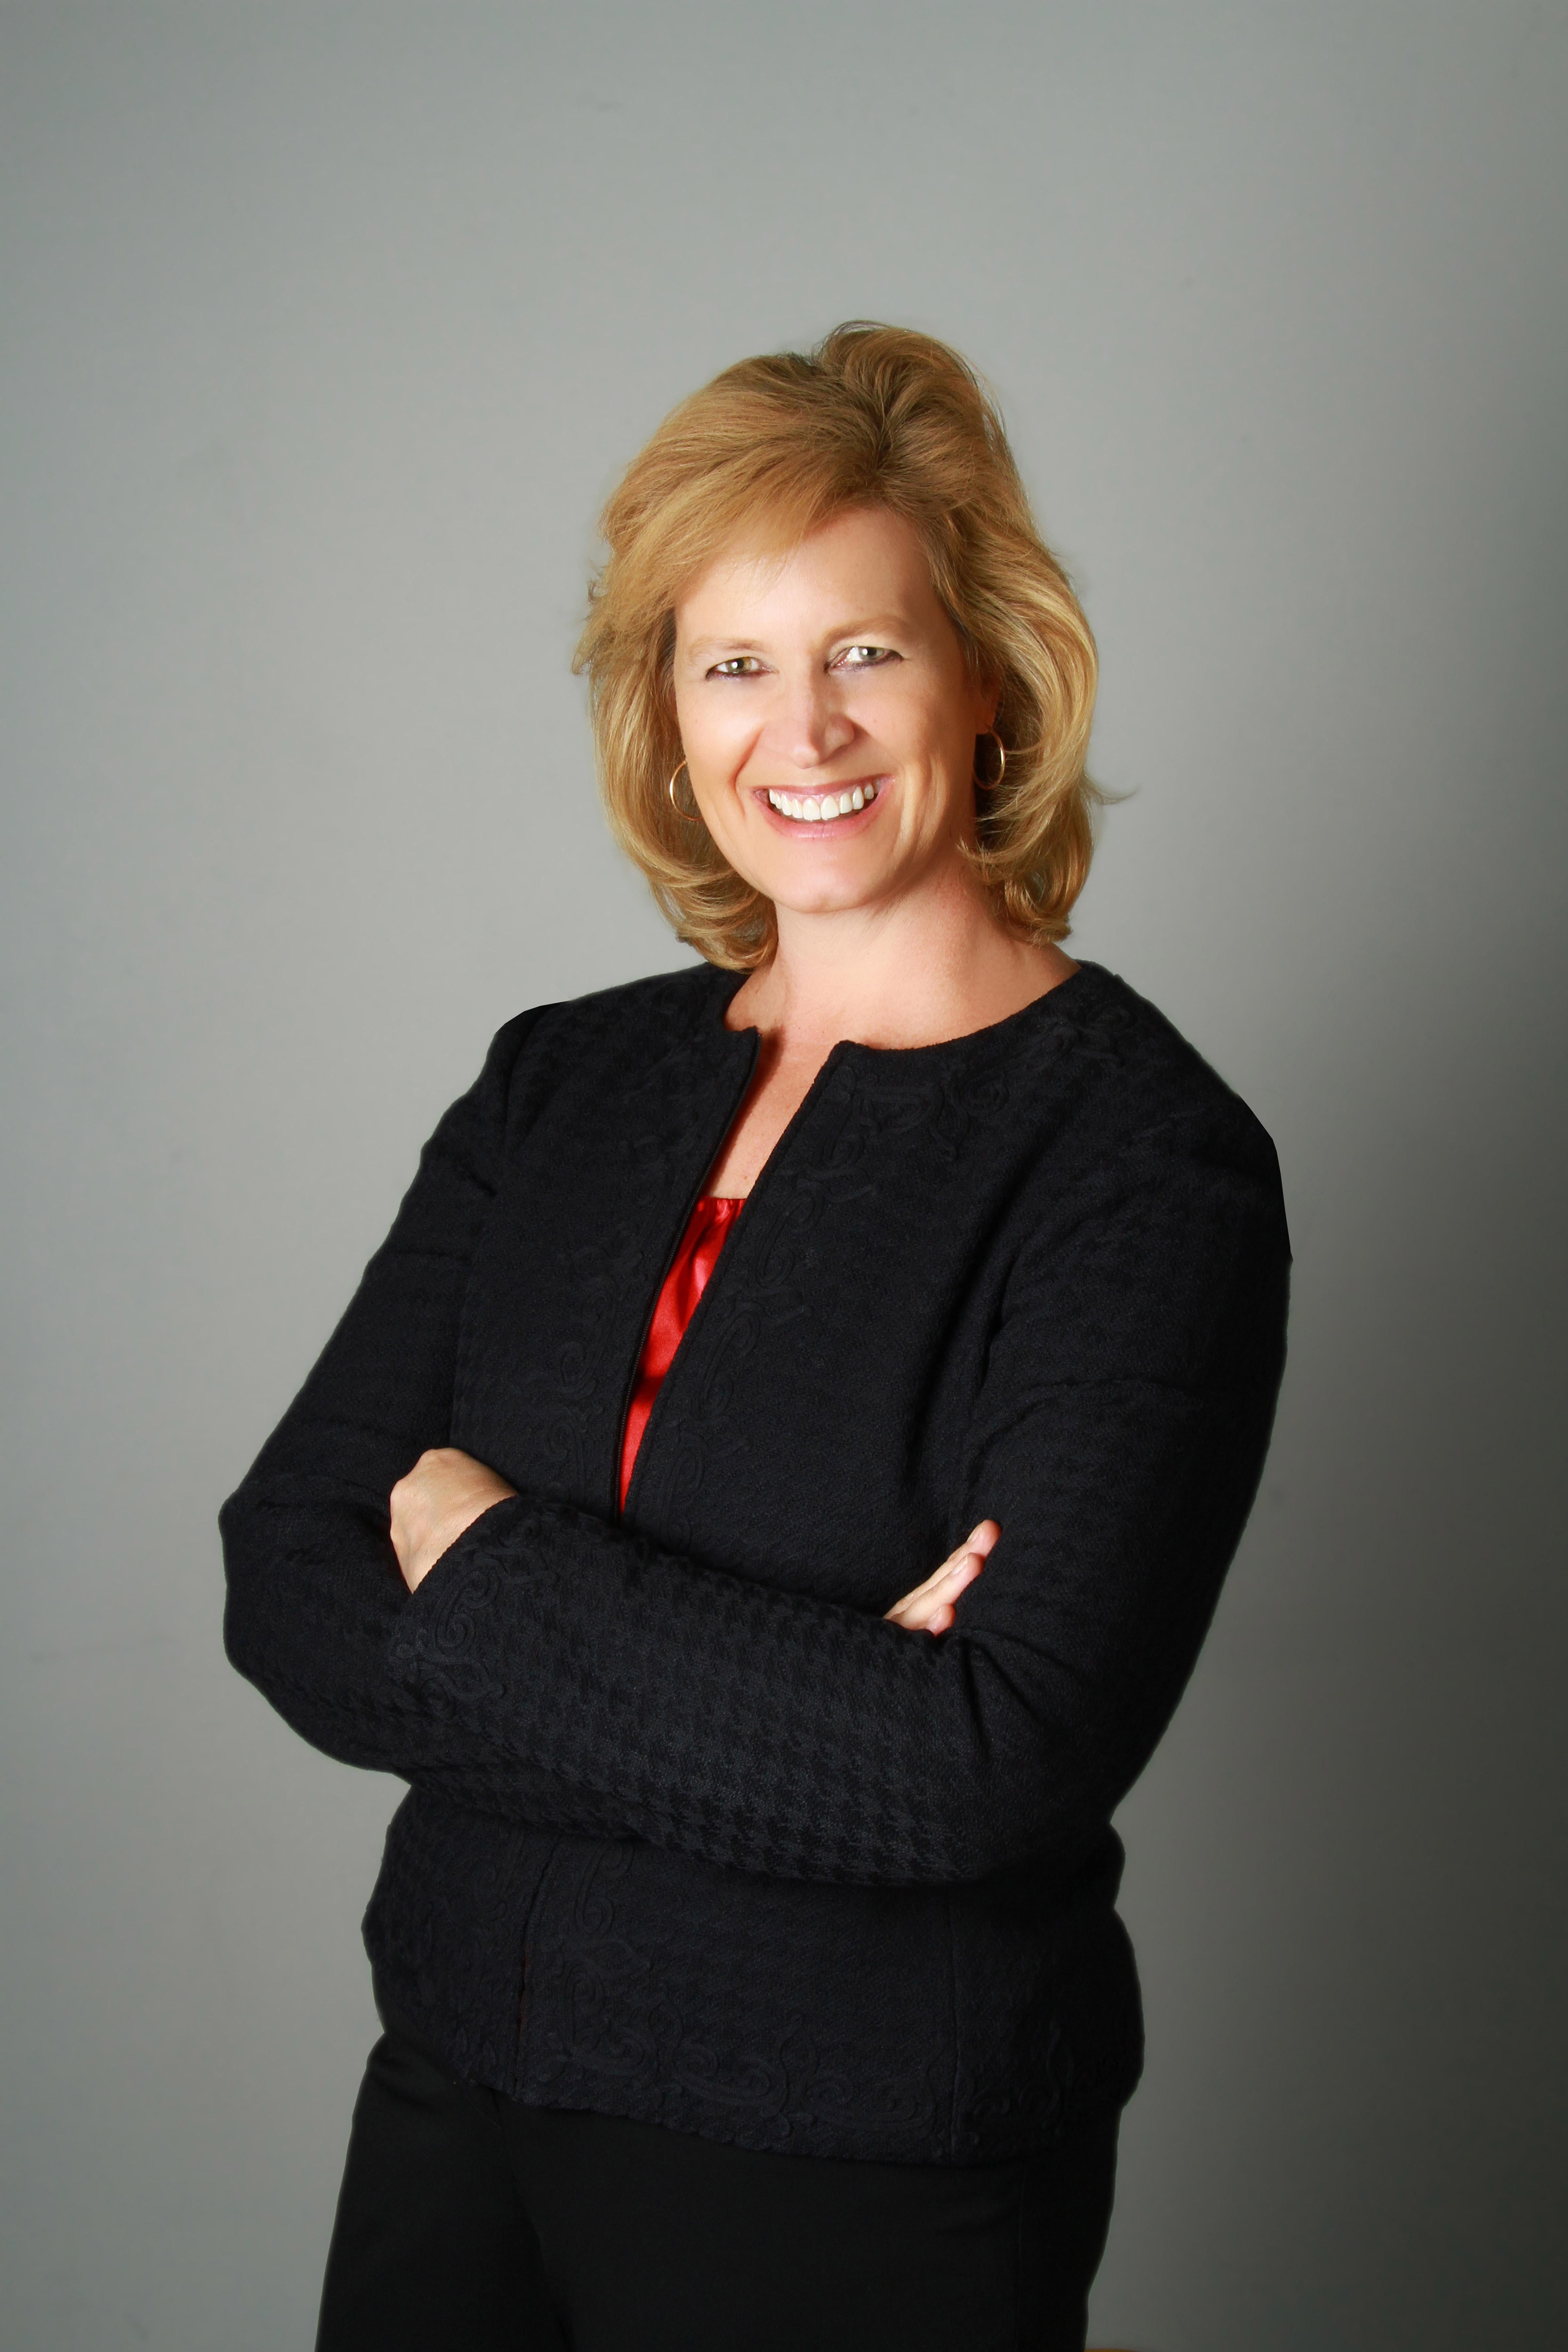 Janet Kennedy, president of Microsoft Canada